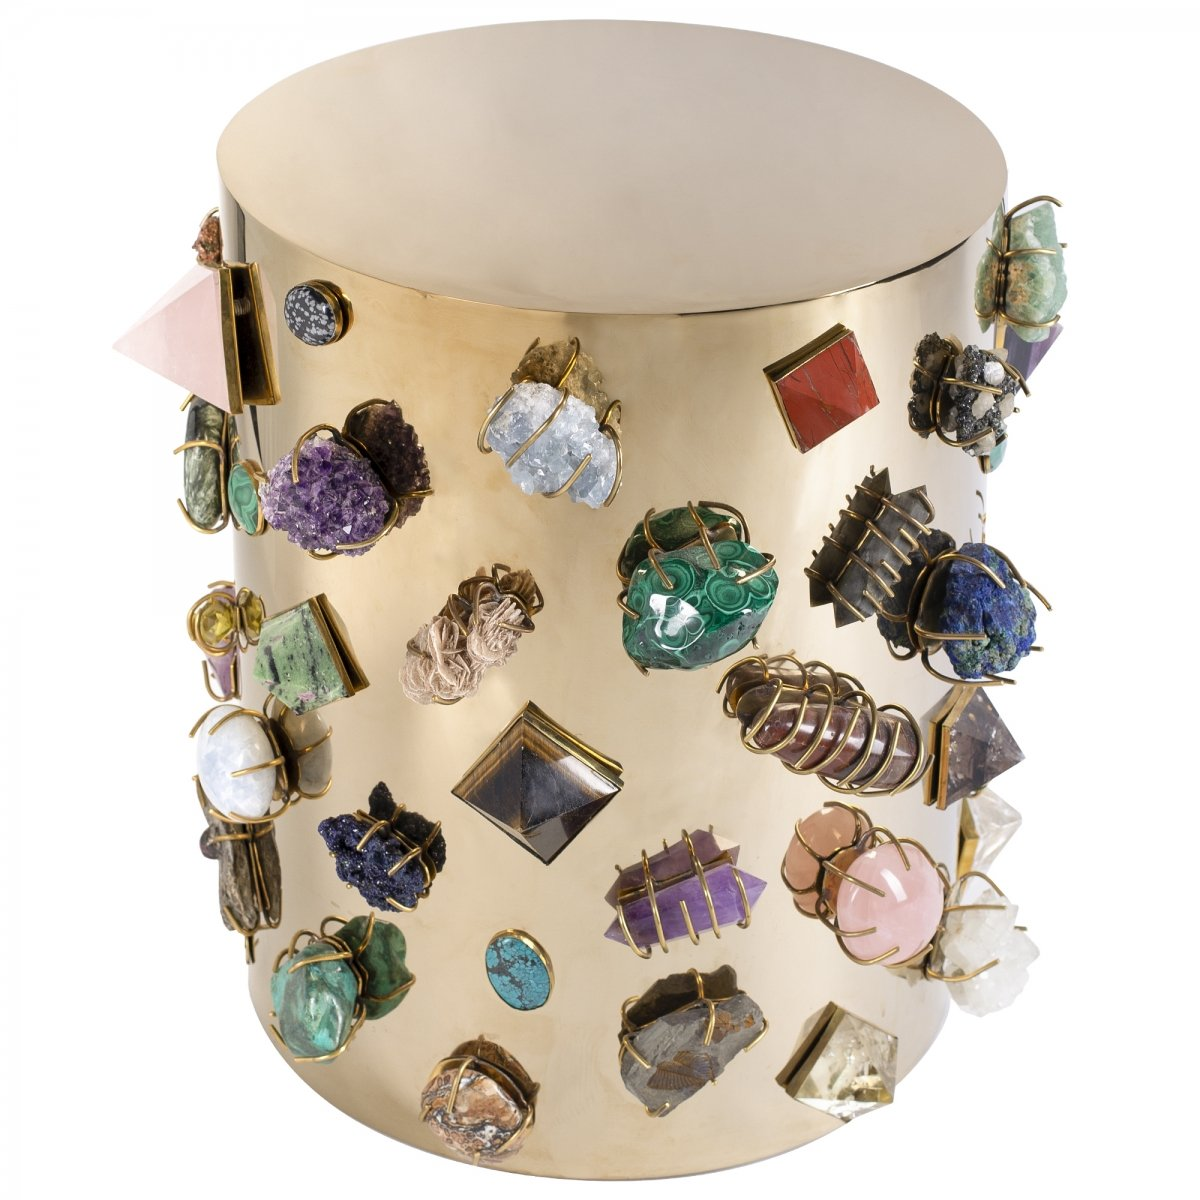 Табурет с полудрагоценными камнями Kelly Wearstler BEJEWELED STOOL  designed by Kelly Wearstler  - фото 1